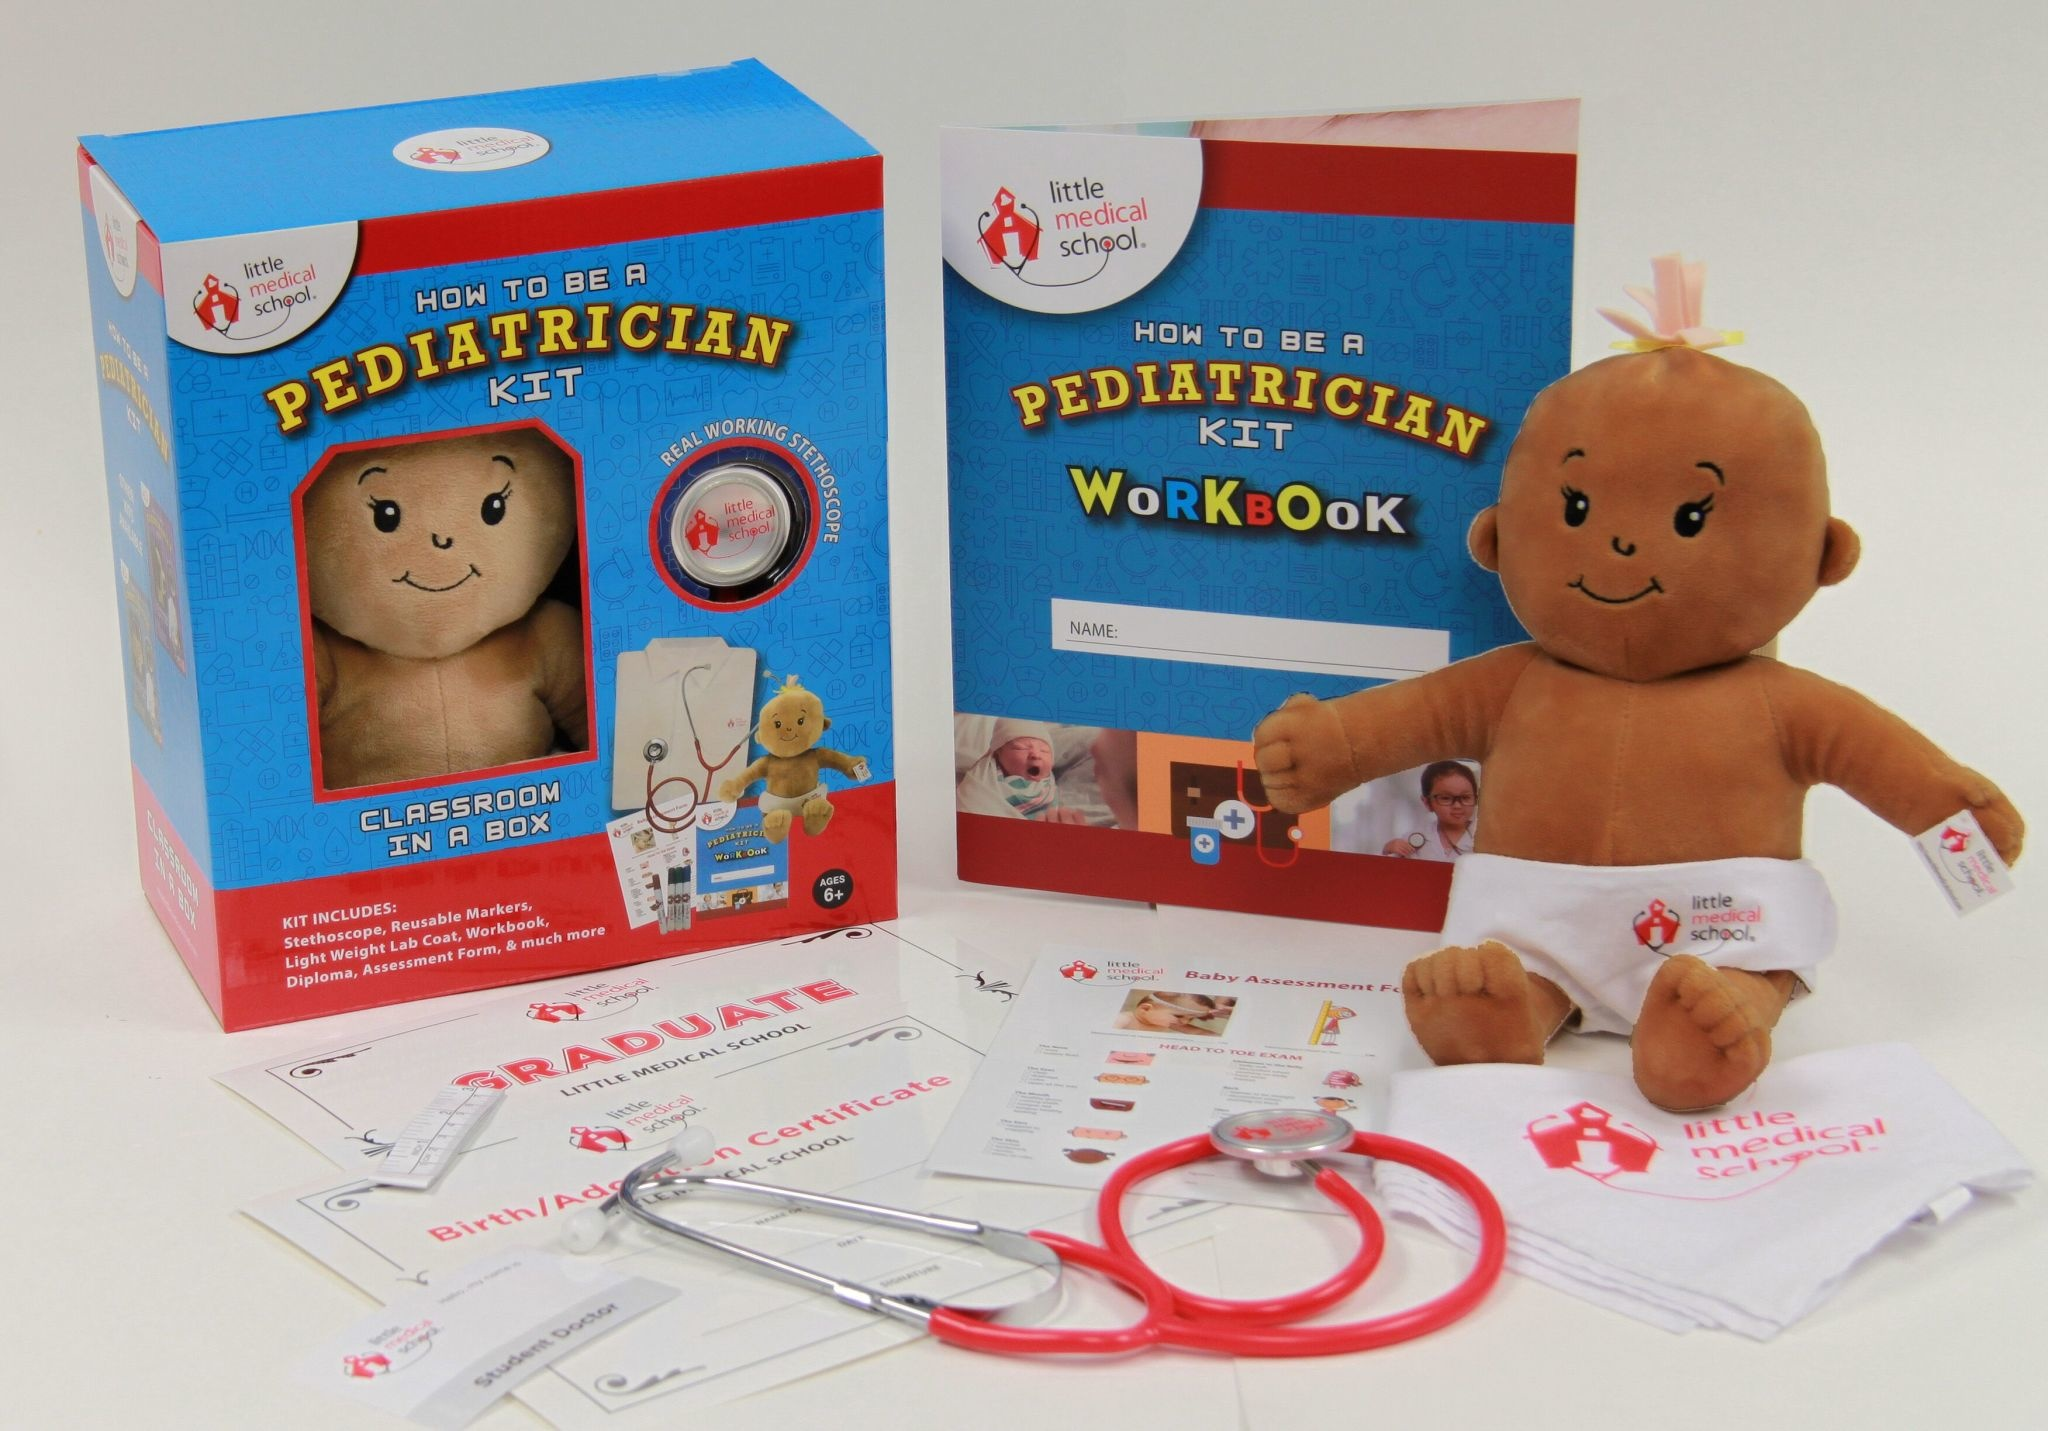 Little Medical School Pediatrician Kit